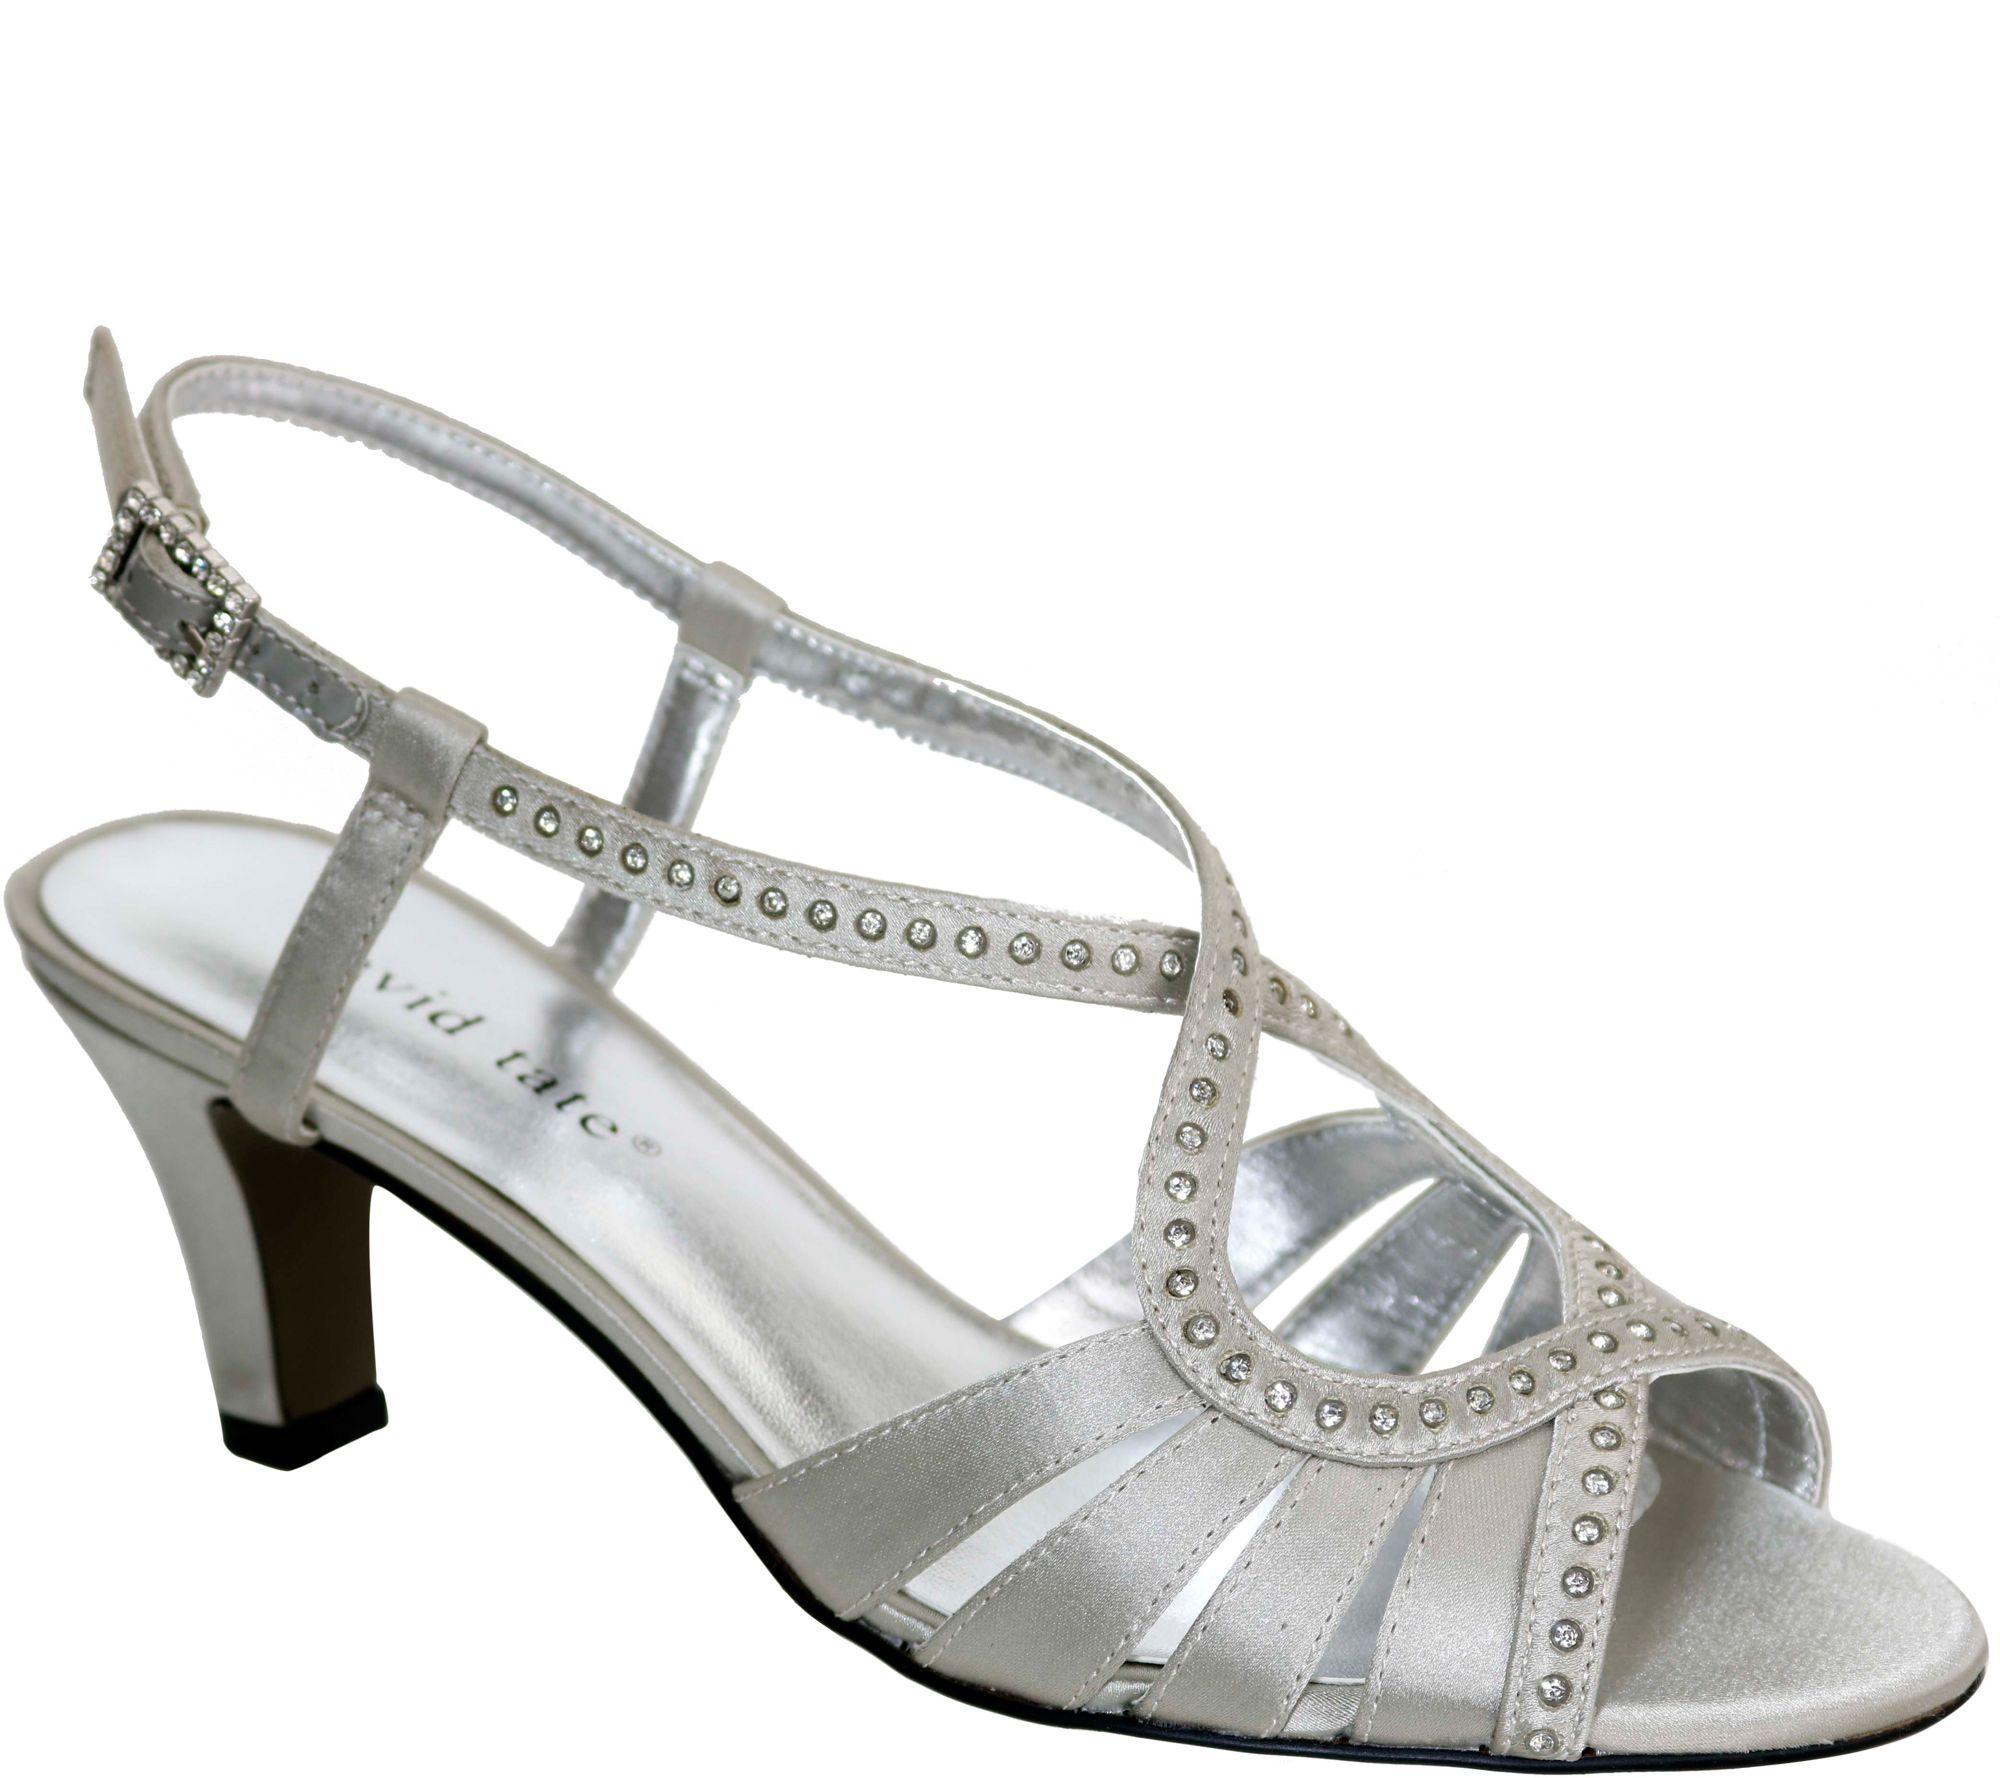 43c88b3e34ba David Tate Dress Sandals - Whisper — QVC.com